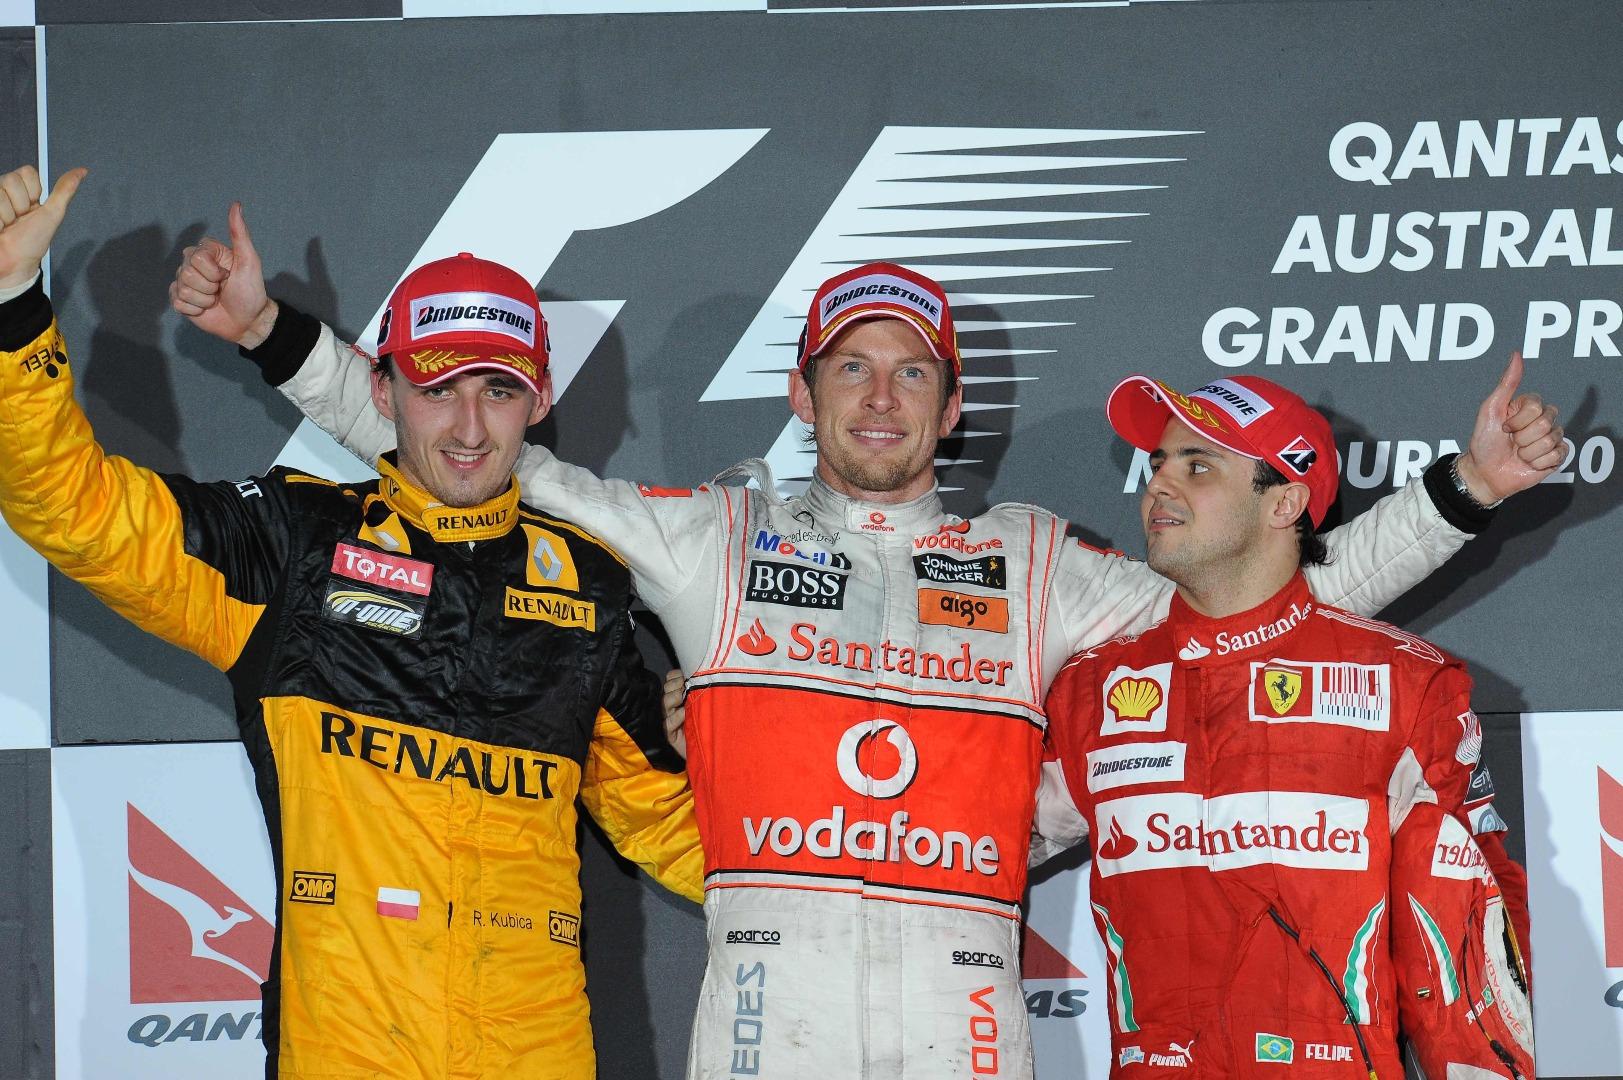 Podio GP Australia